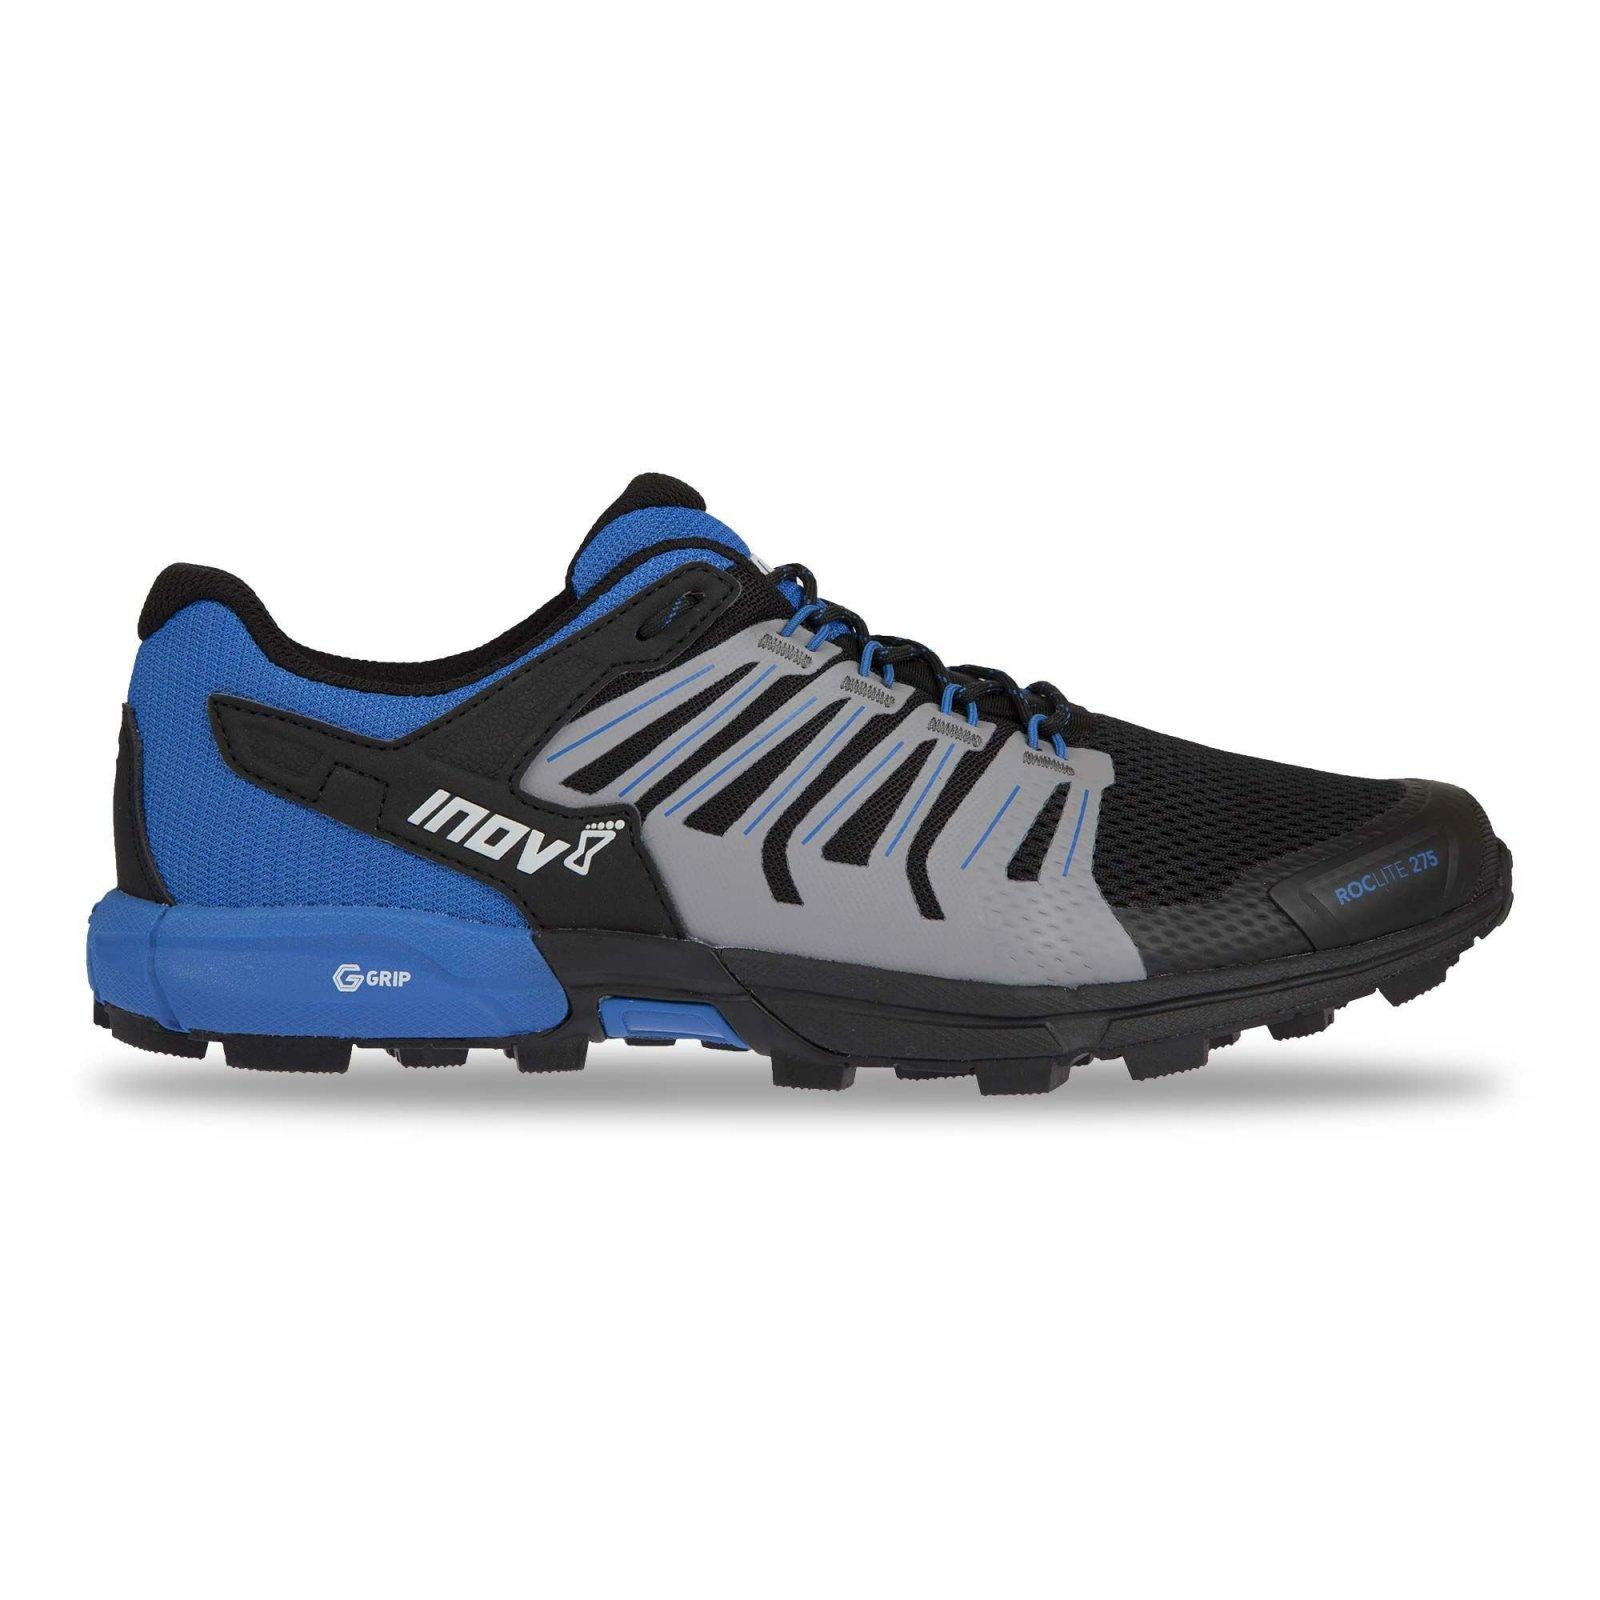 505b27676e Trailové boty Inov-8 Roclite 275 (M) black blue M 000806-BKBL-M-01 ...